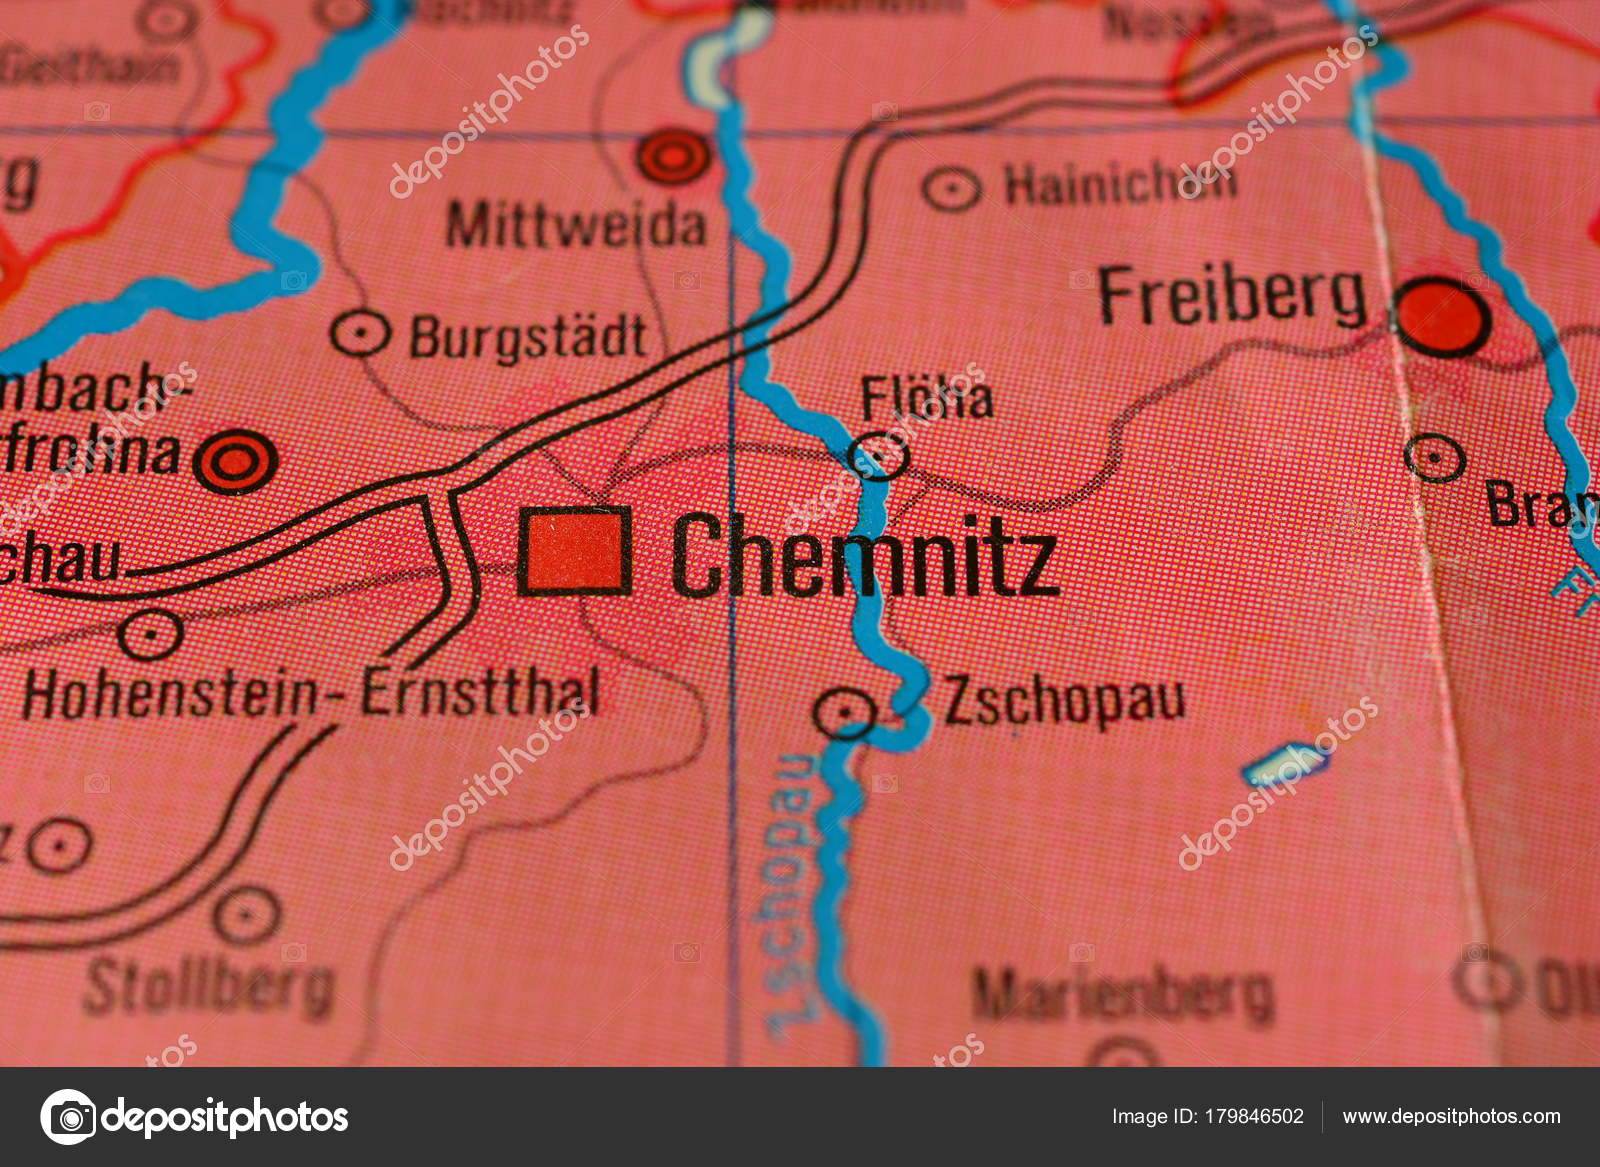 Chemnitz Karte.Stadt Name Chemnitz Auf Der Karte Stockfoto C Photographer